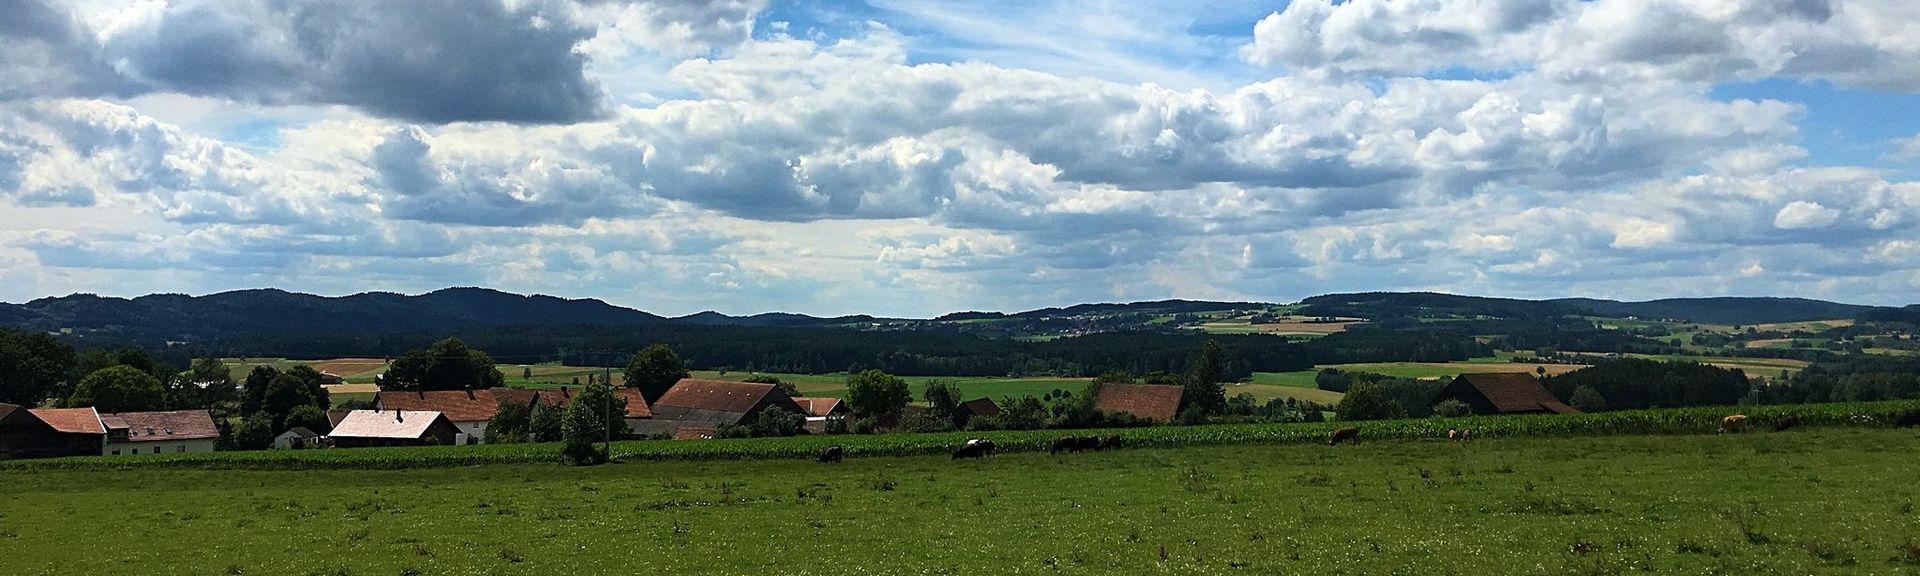 Neukirchen-Balbini, Germany